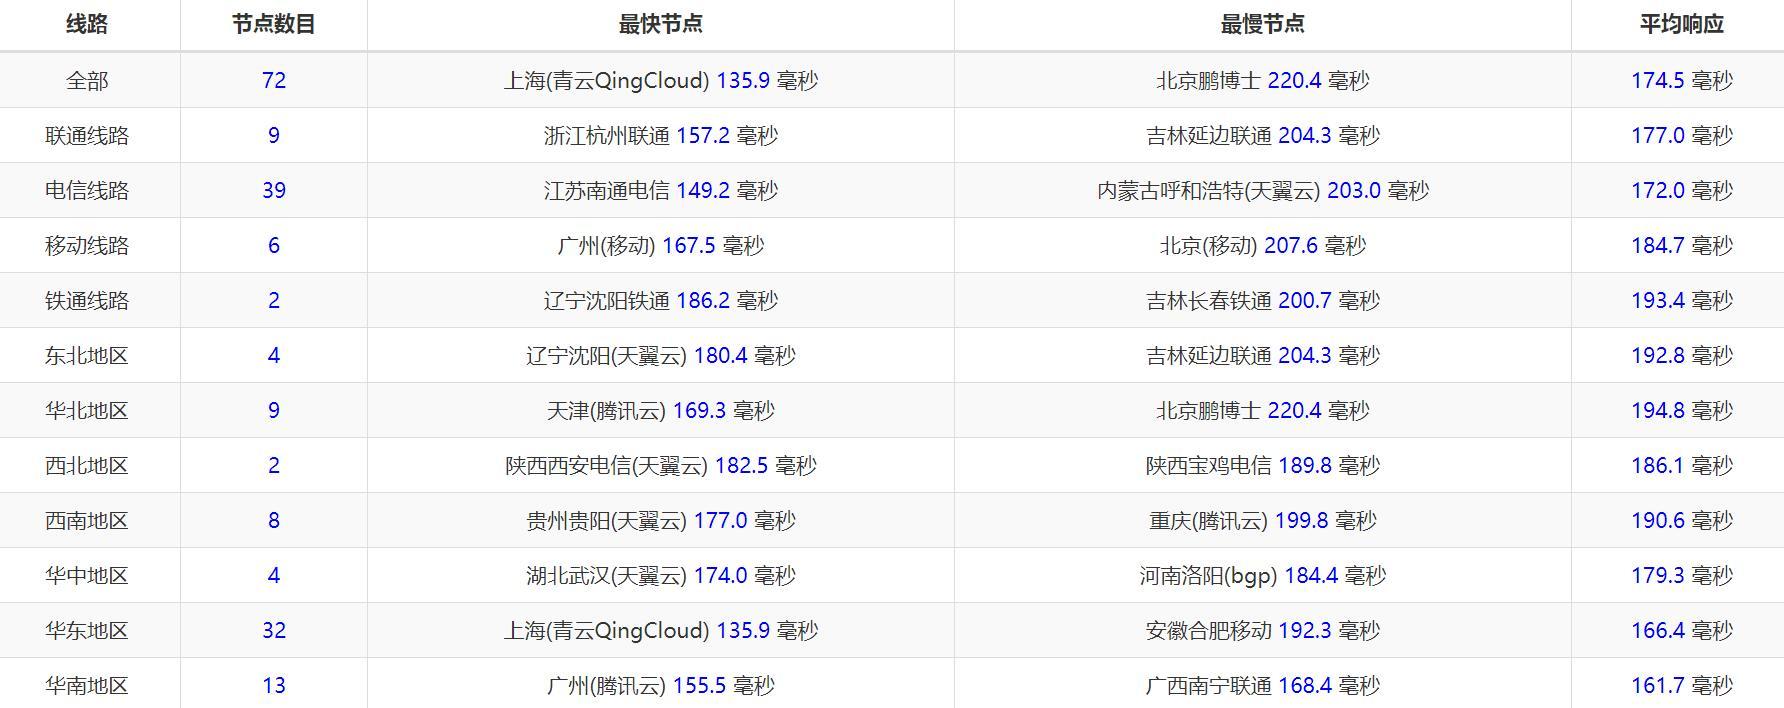 T667-la-cn2-ping.jpg